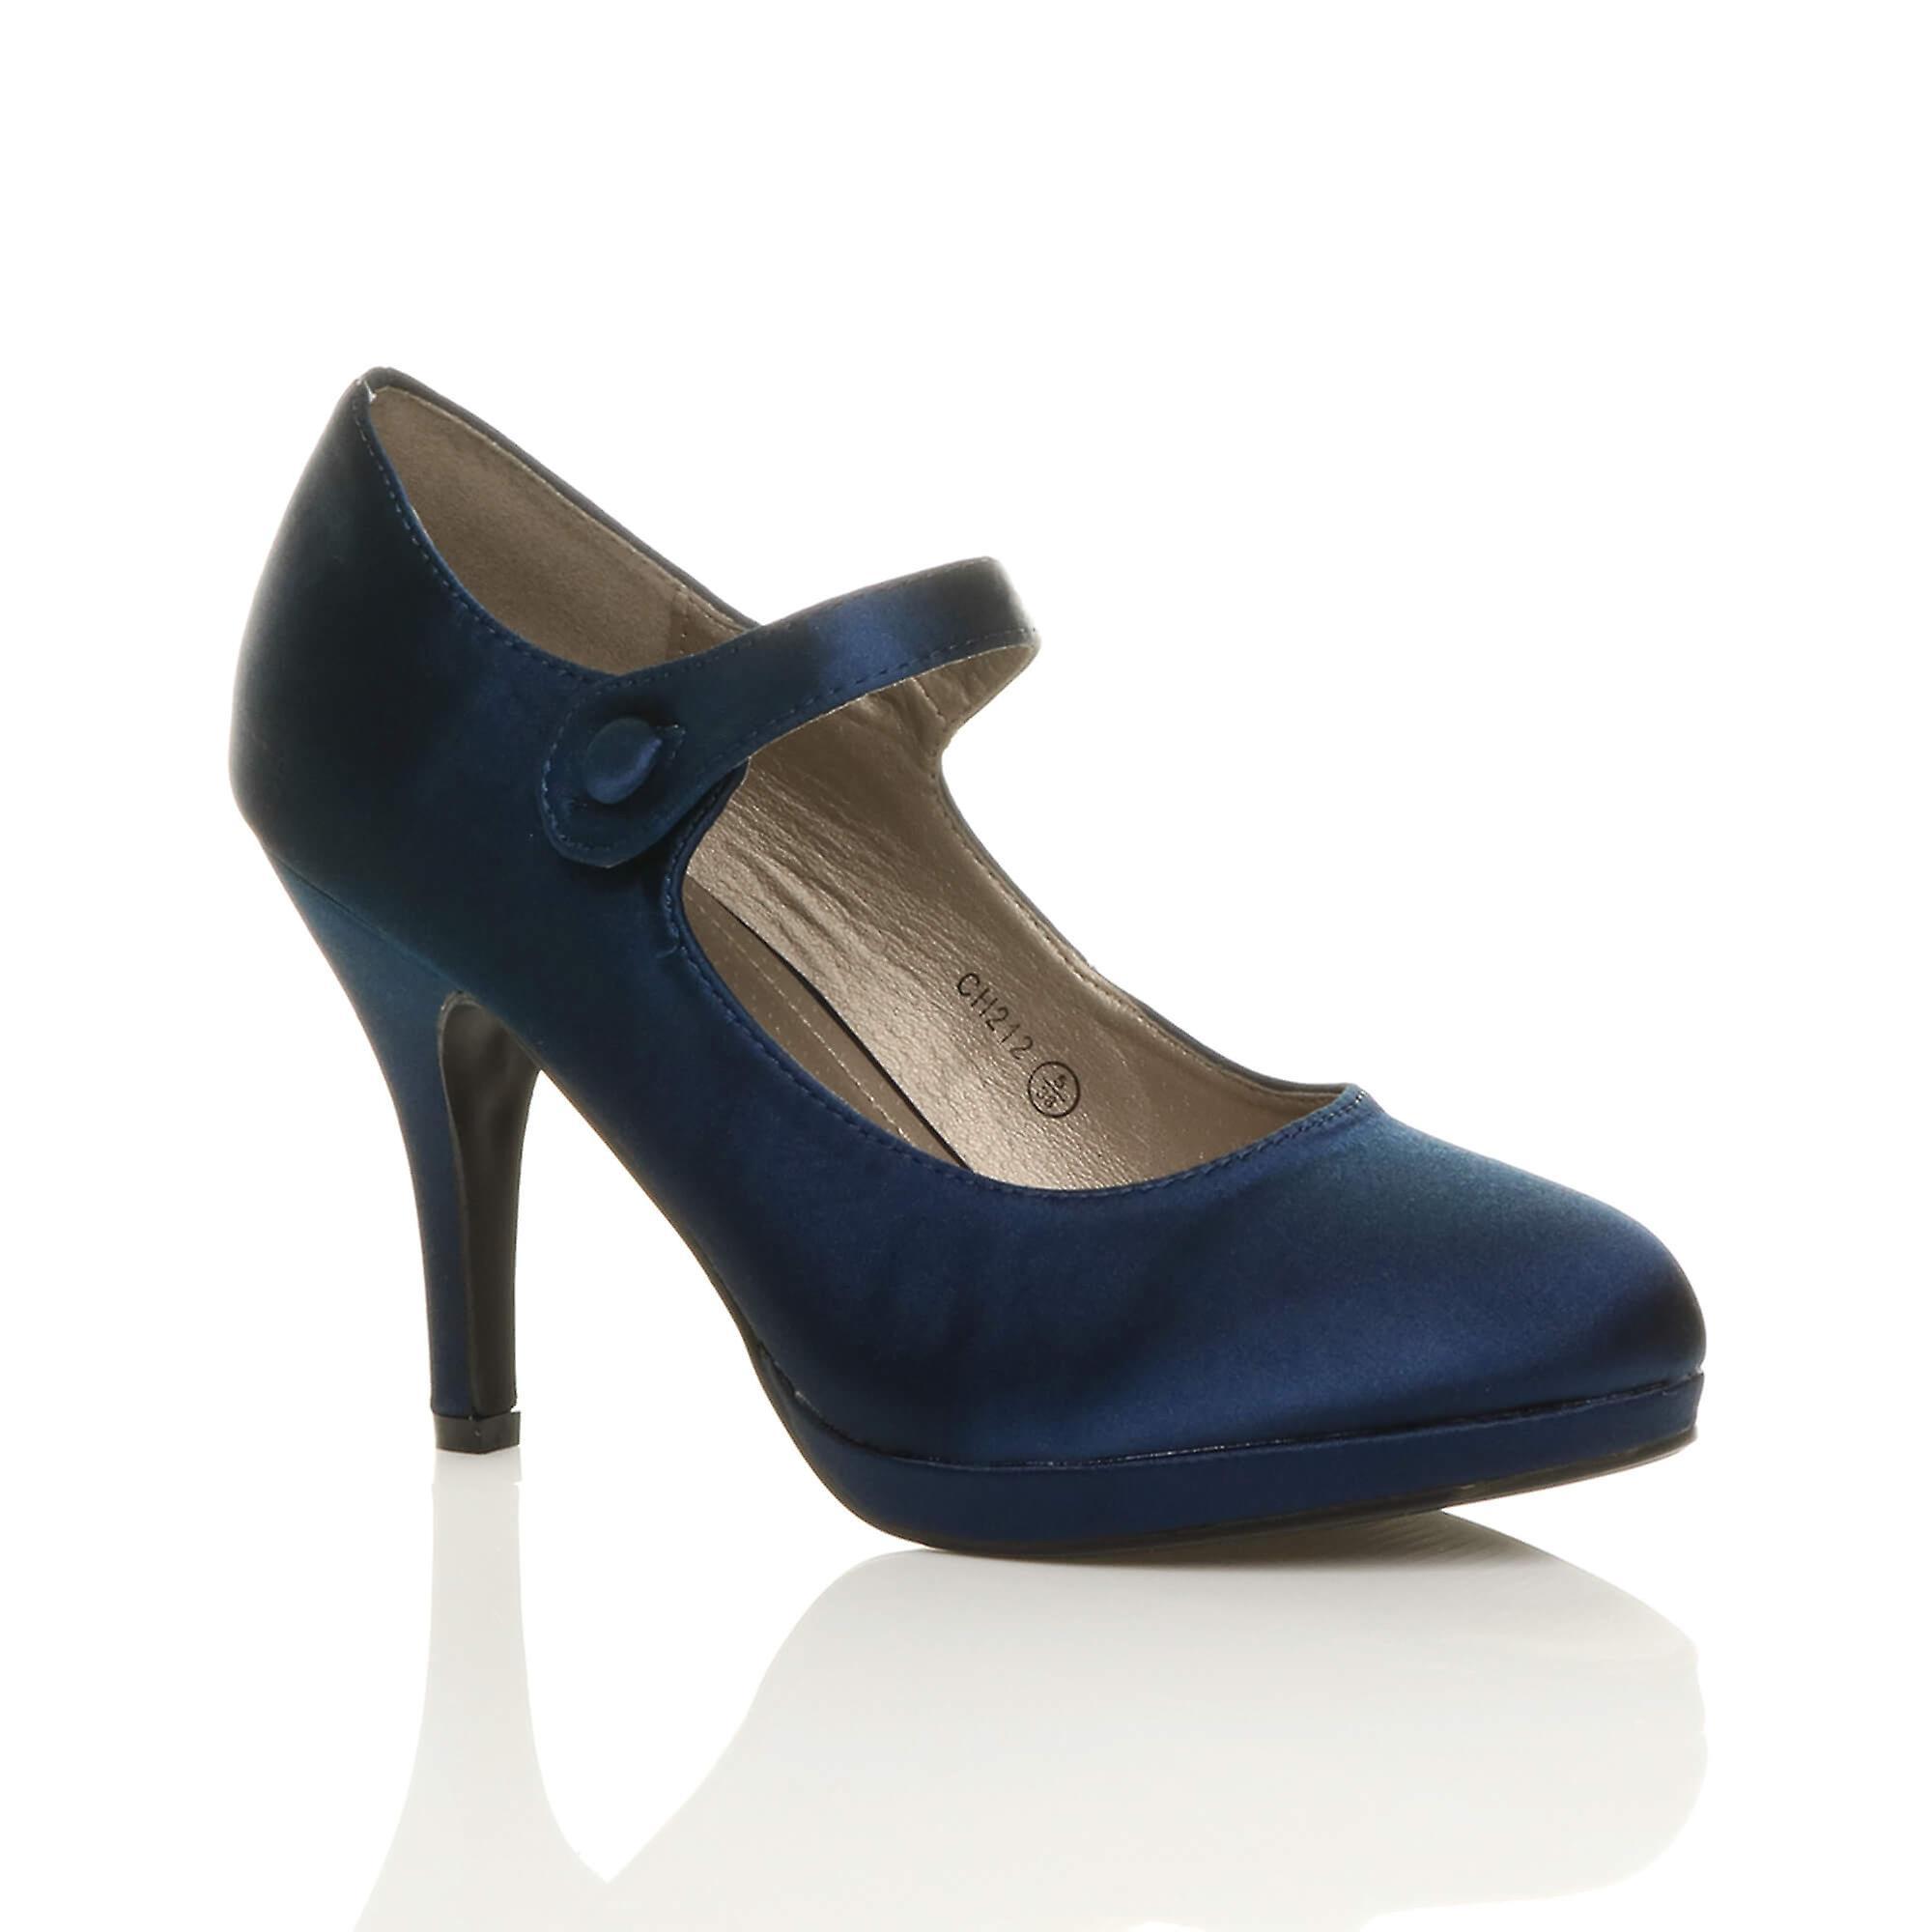 5850a54bc91 Ajvani womens mid high heel mary jane evening work platform court shoes